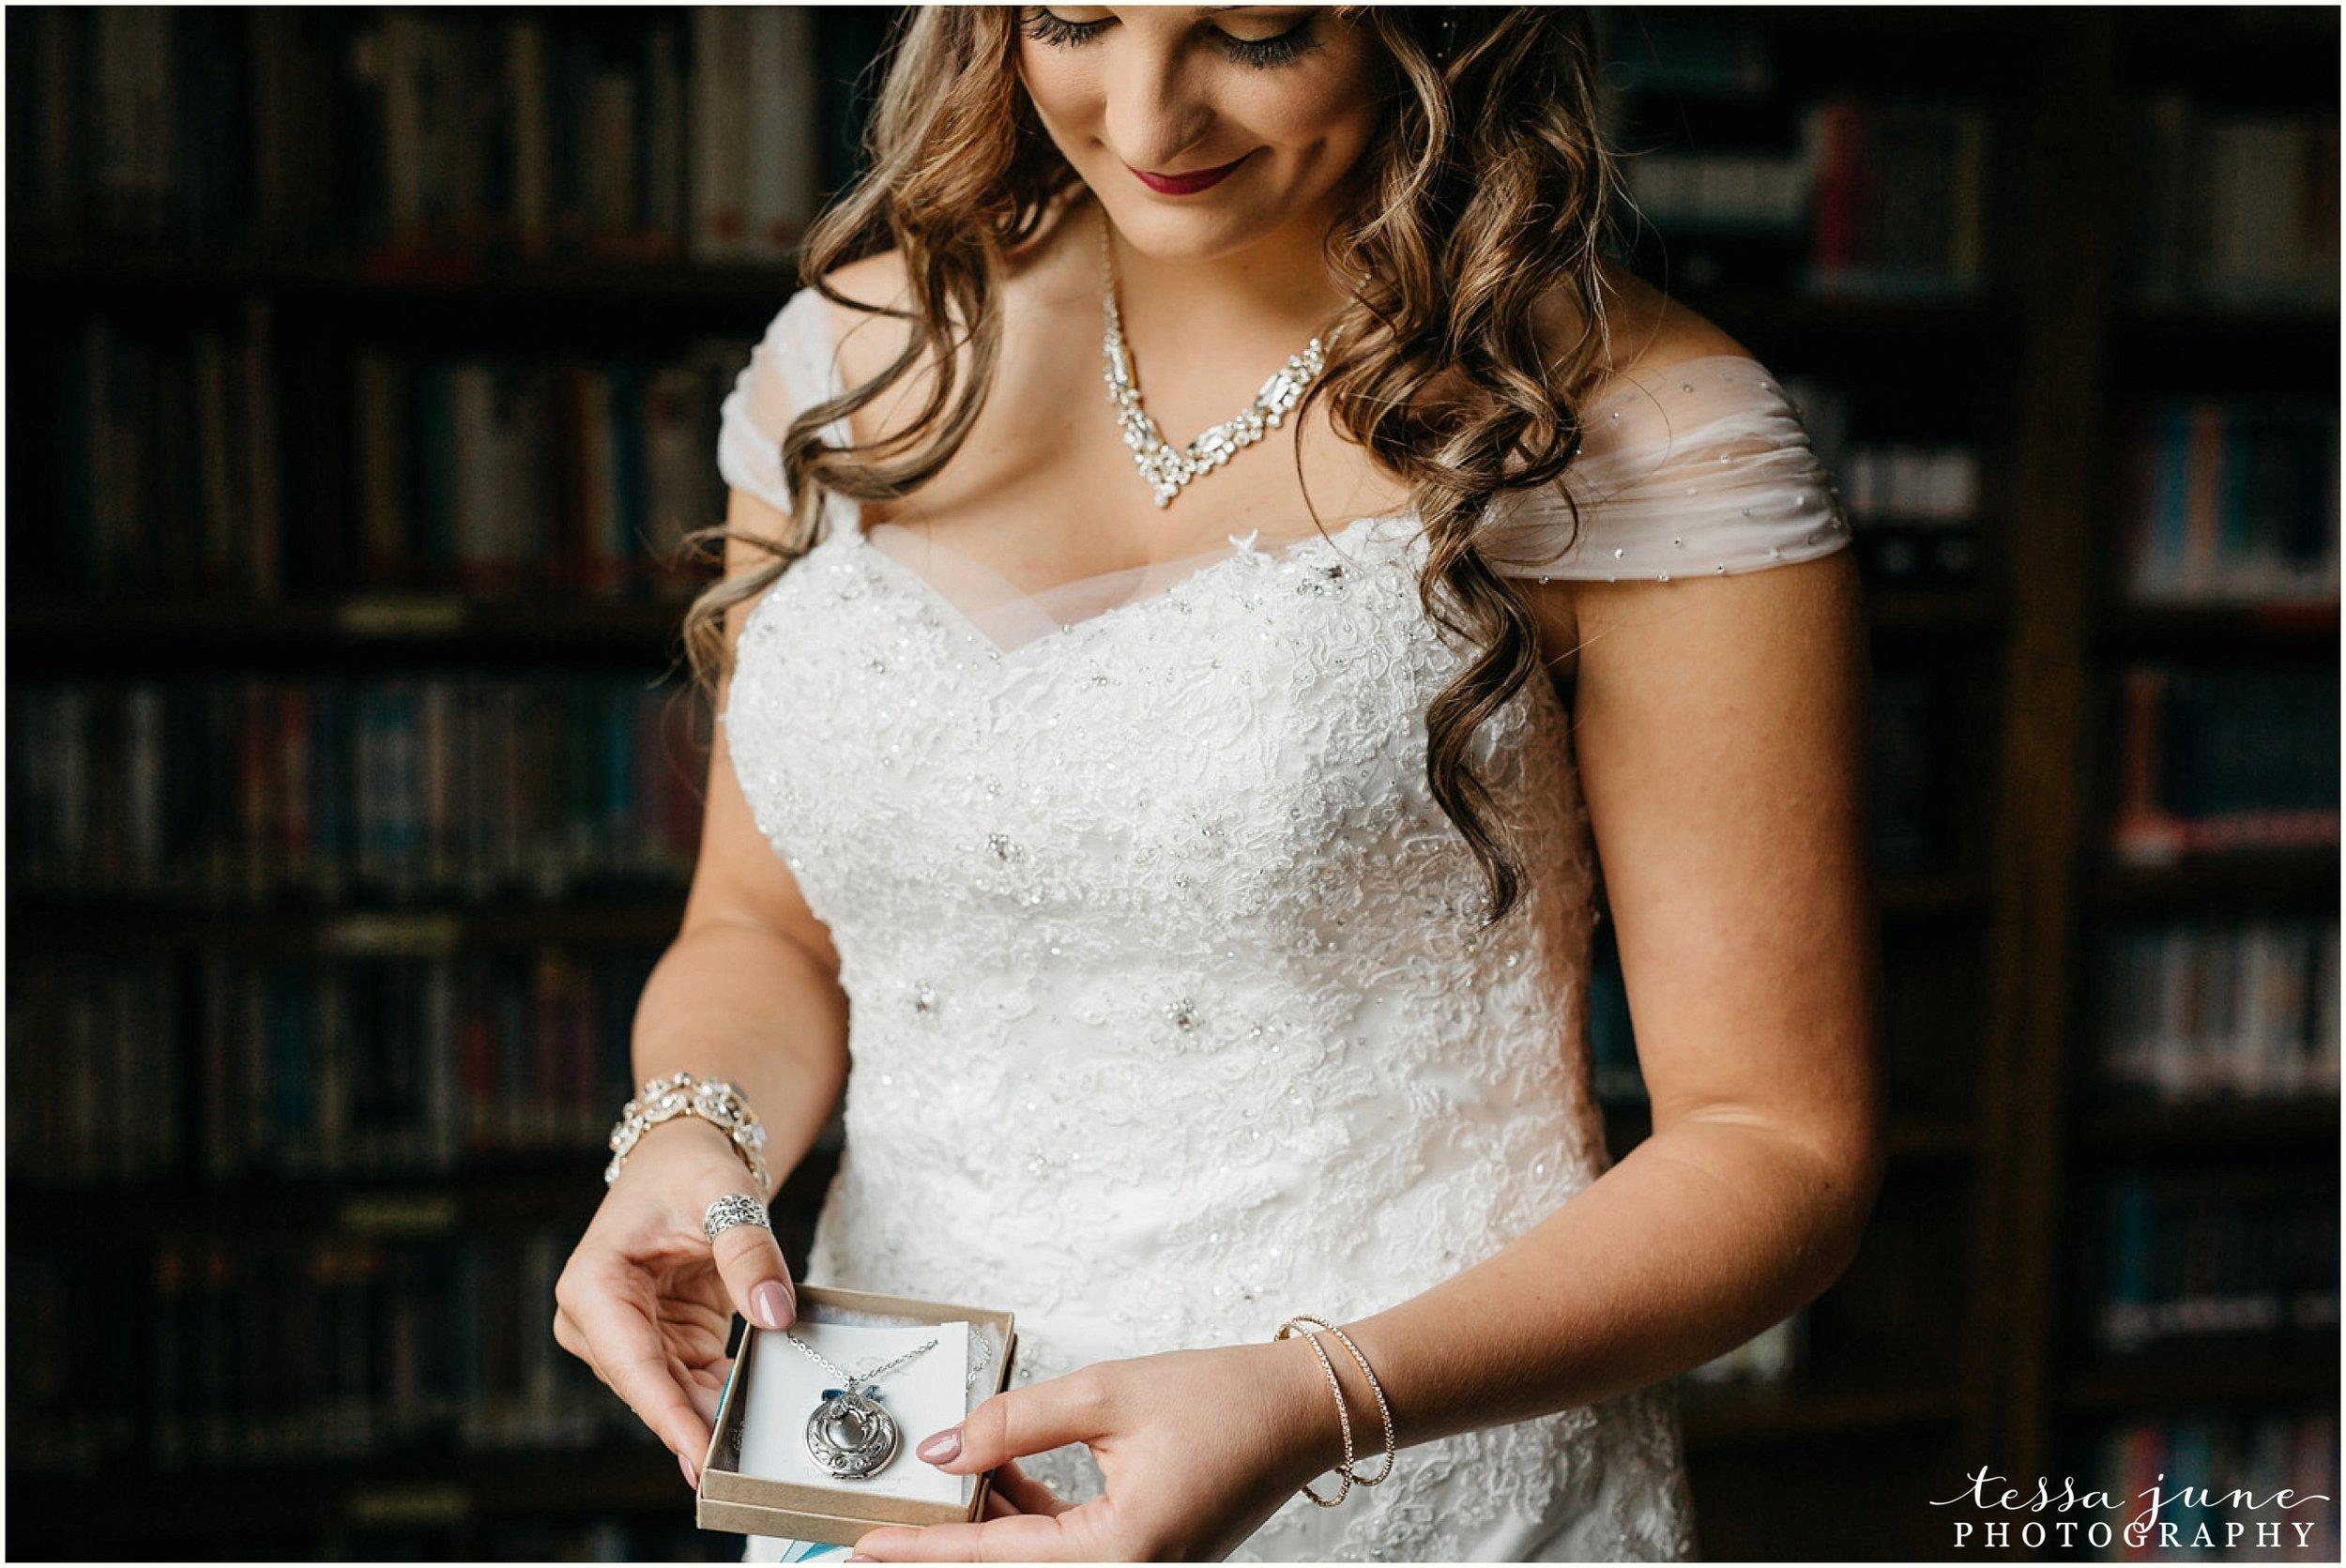 bohemian-minnesota-wedding-mismatched-bridesmaid-dresses-waterfall-st-cloud-tessa-june-photography-32.jpg